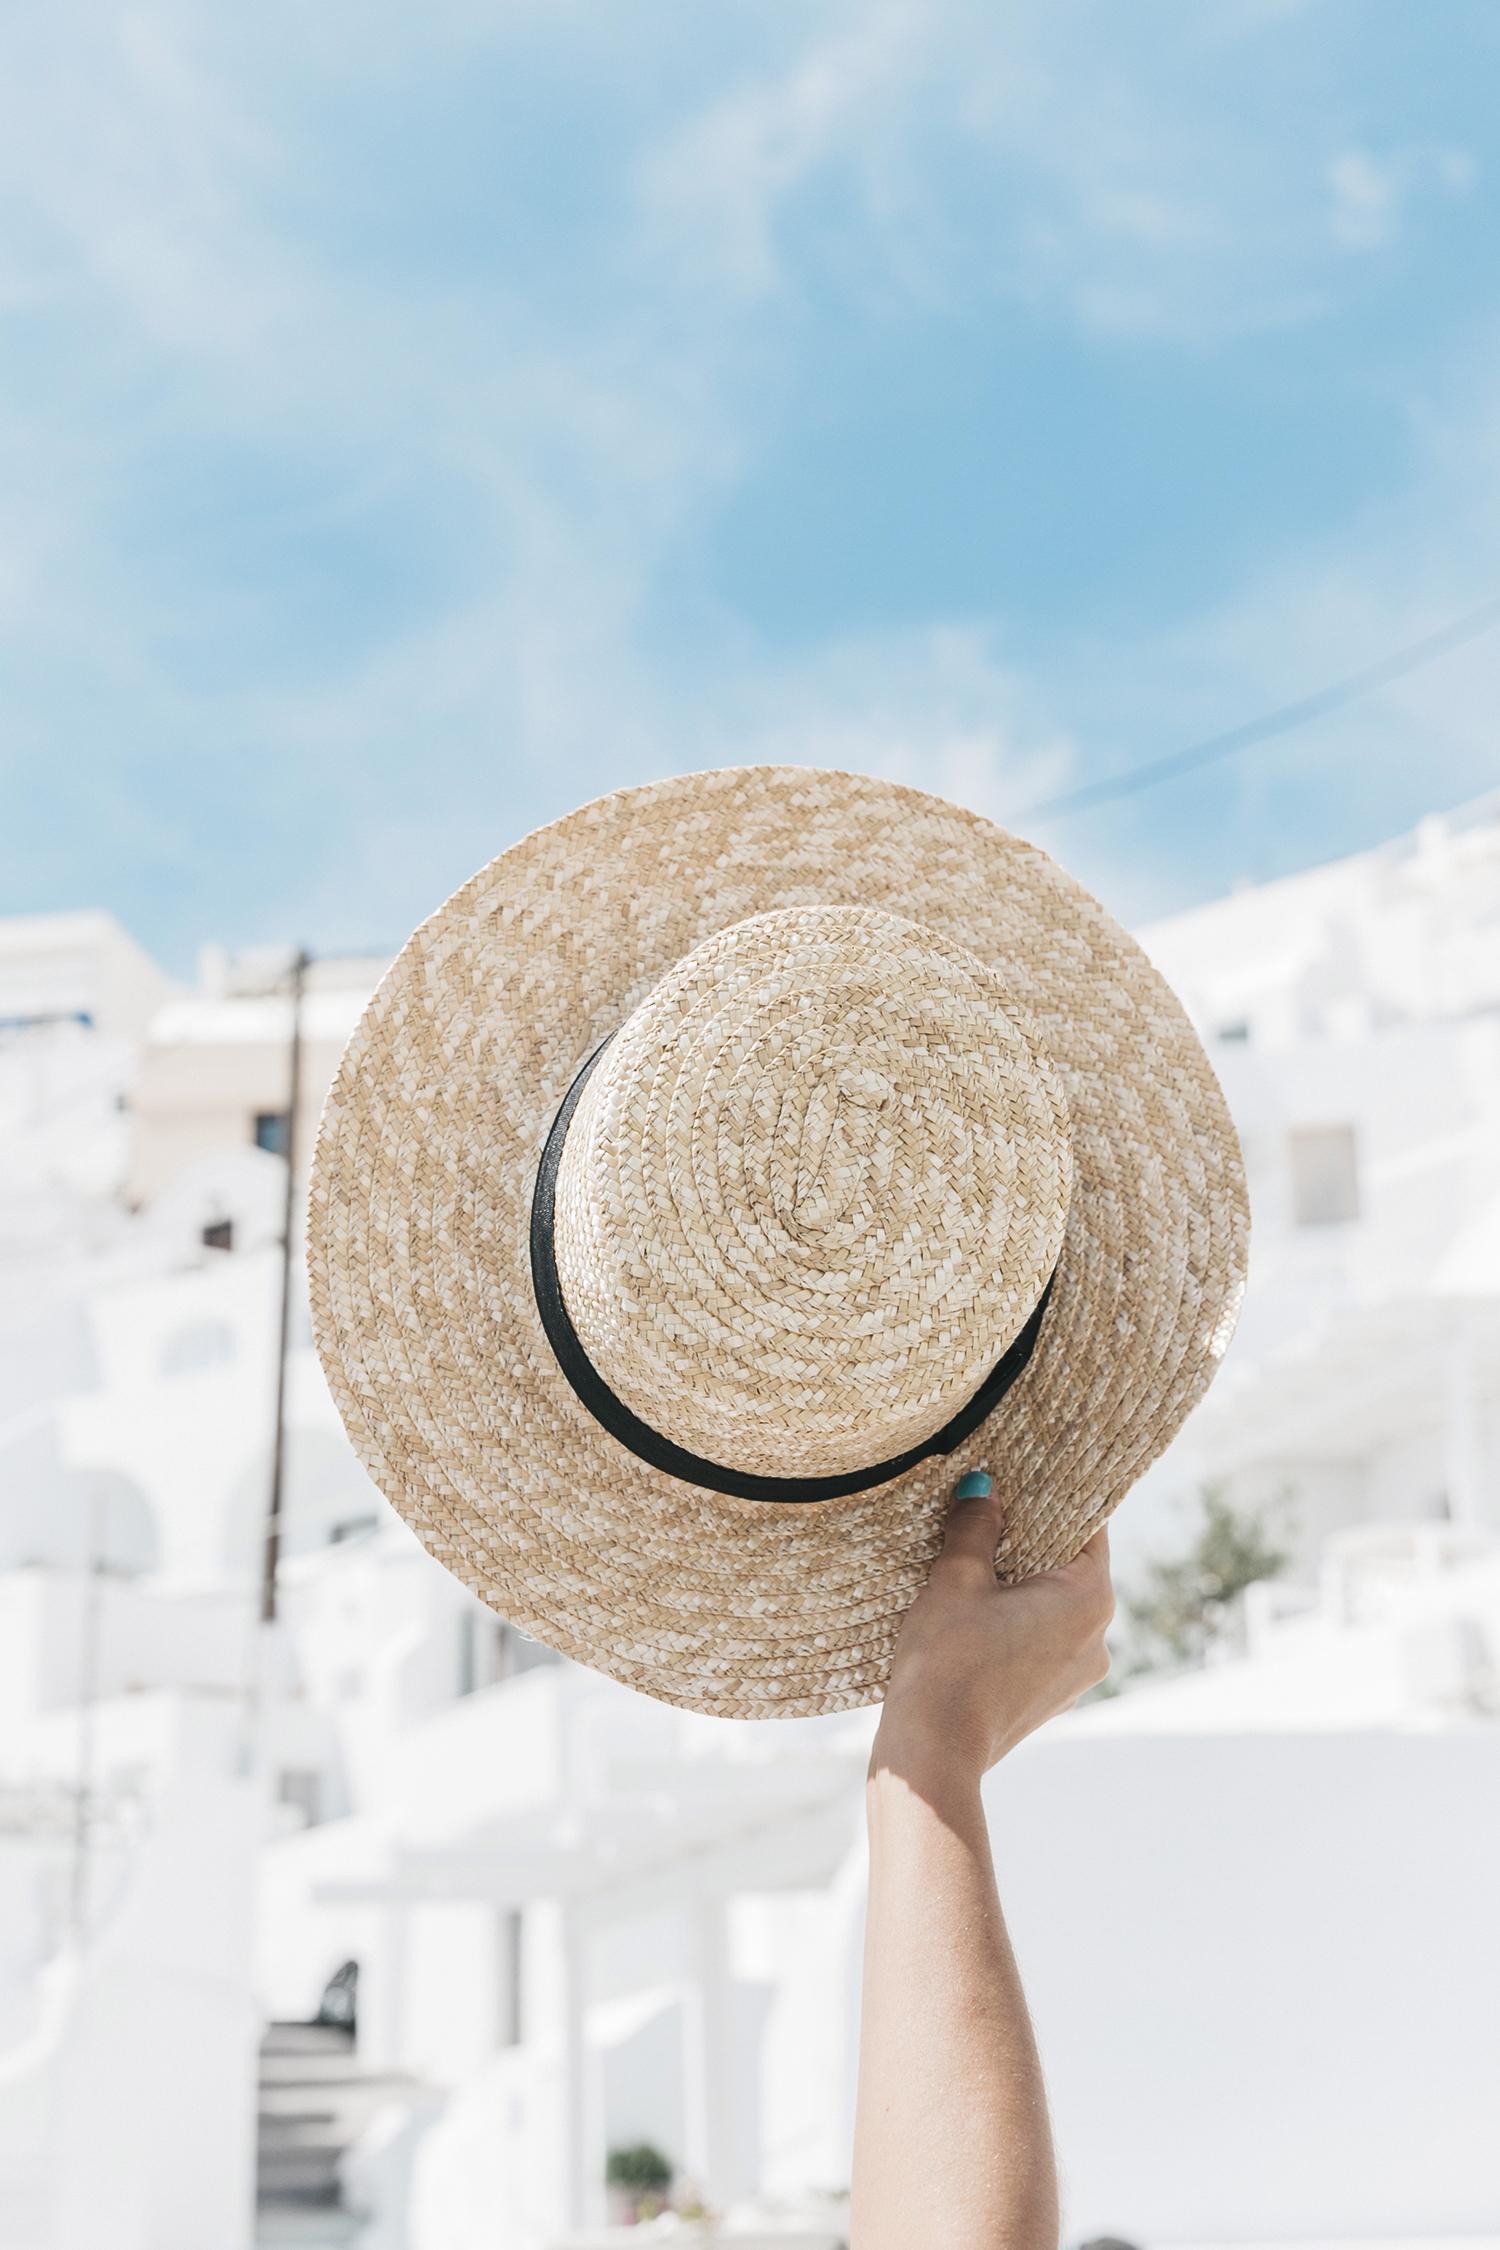 Blue_Dress-Soludos_Escapes-Soludos_Espadrilles-Canotier-Hat-Lack_Of_Color-Summer-Santorini-Collage_Vintage-80